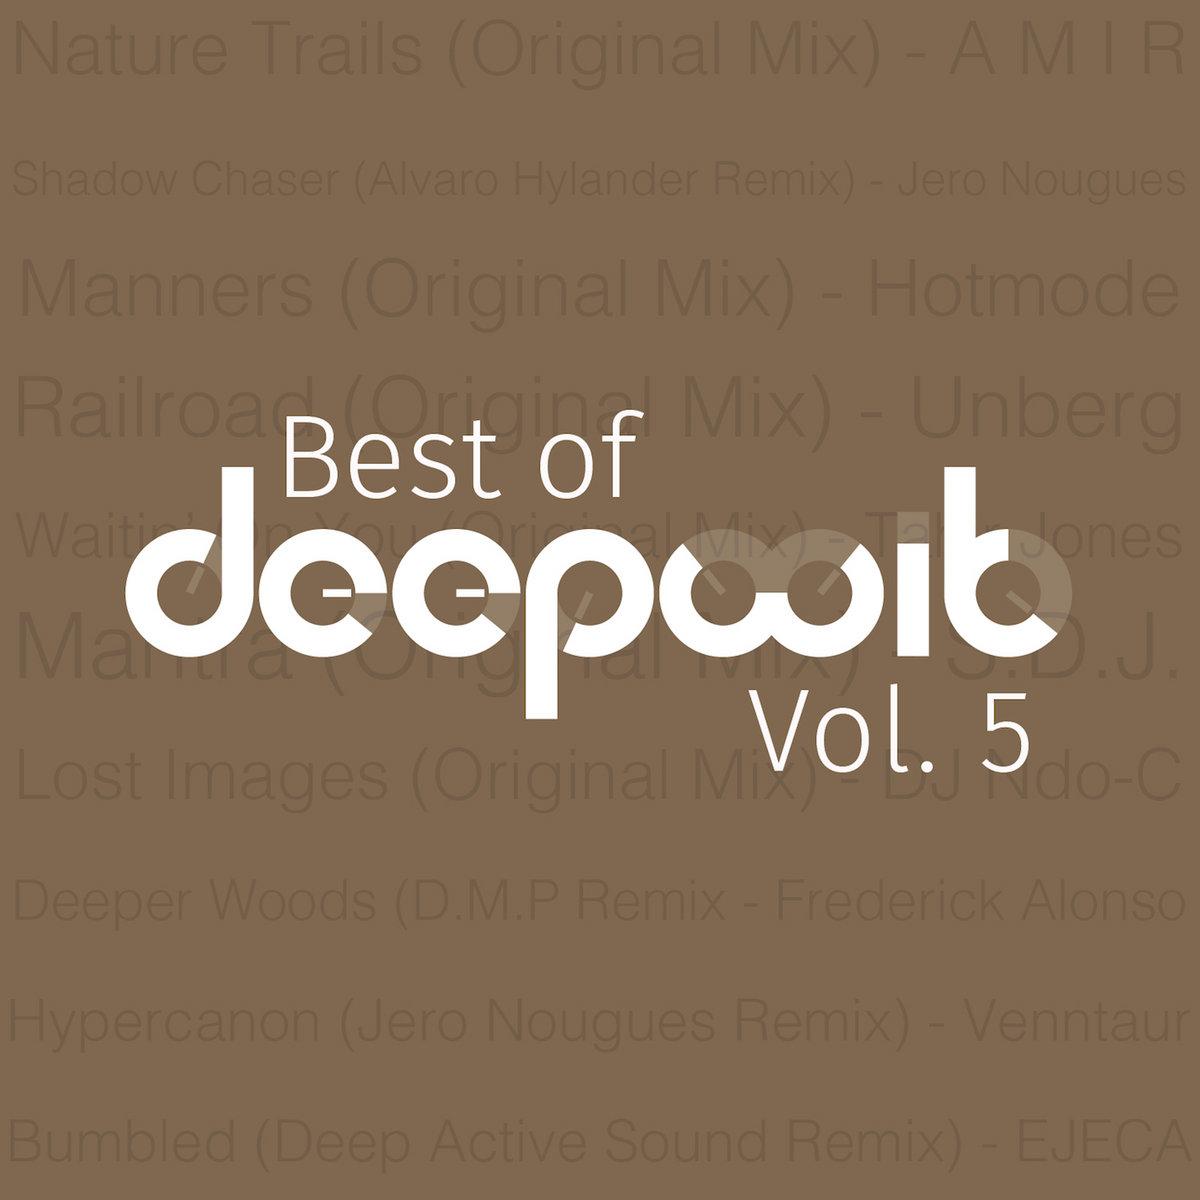 Deeper Woods (D M P Remix) | DeepWit Recordings